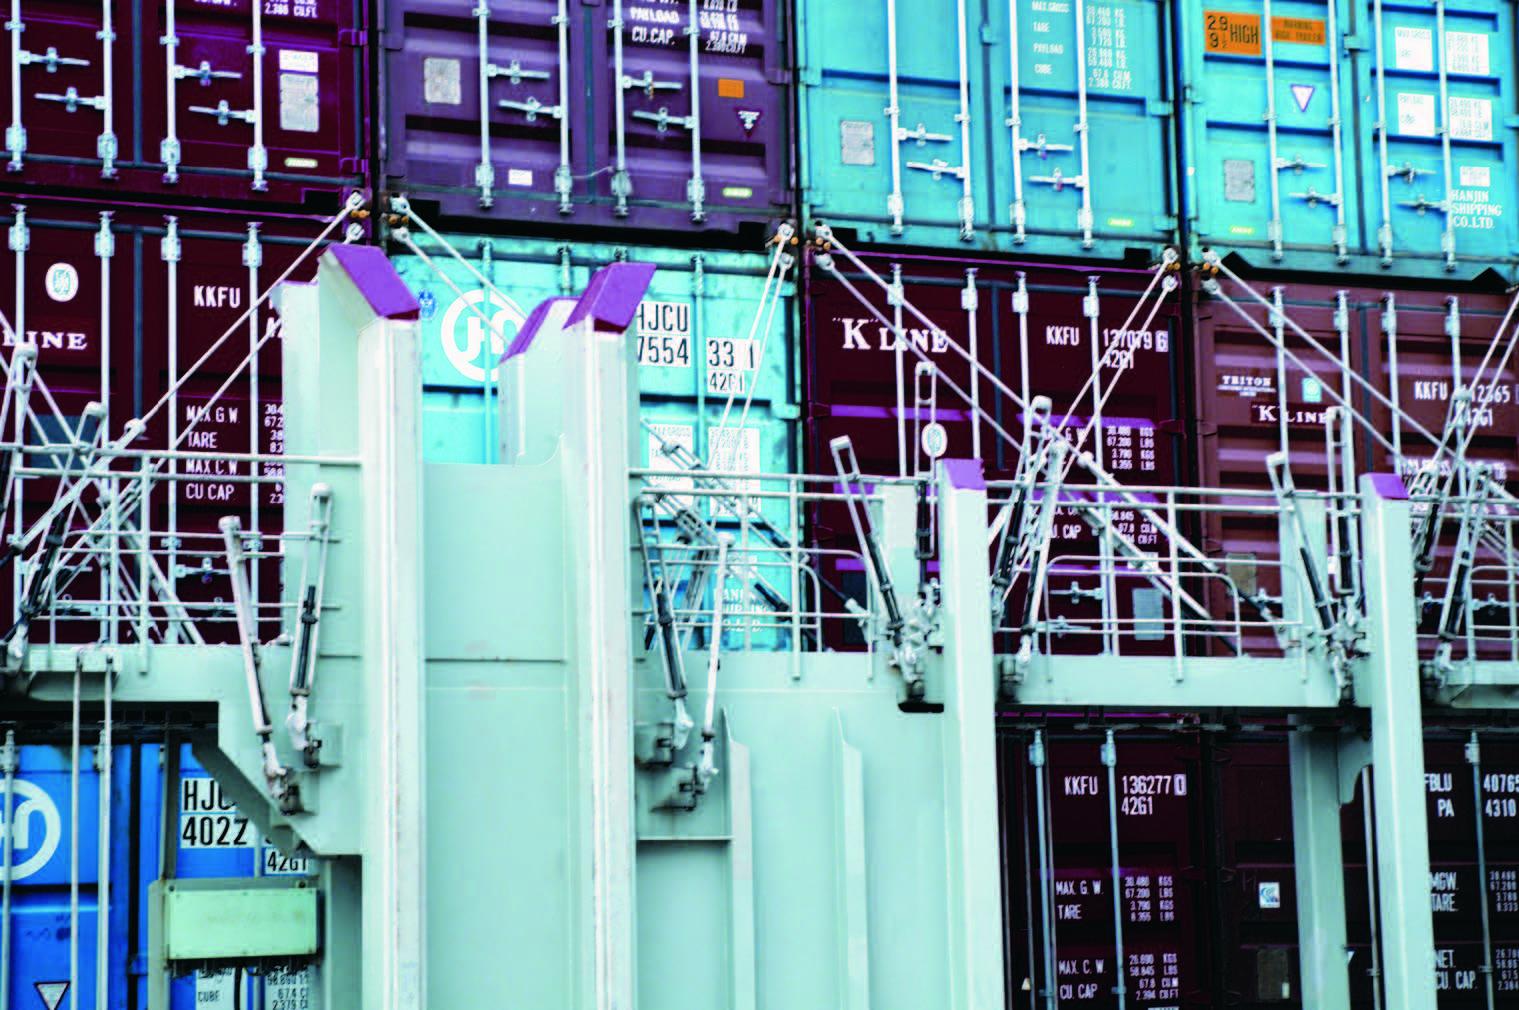 Container lashing equipment, container-securing equipment